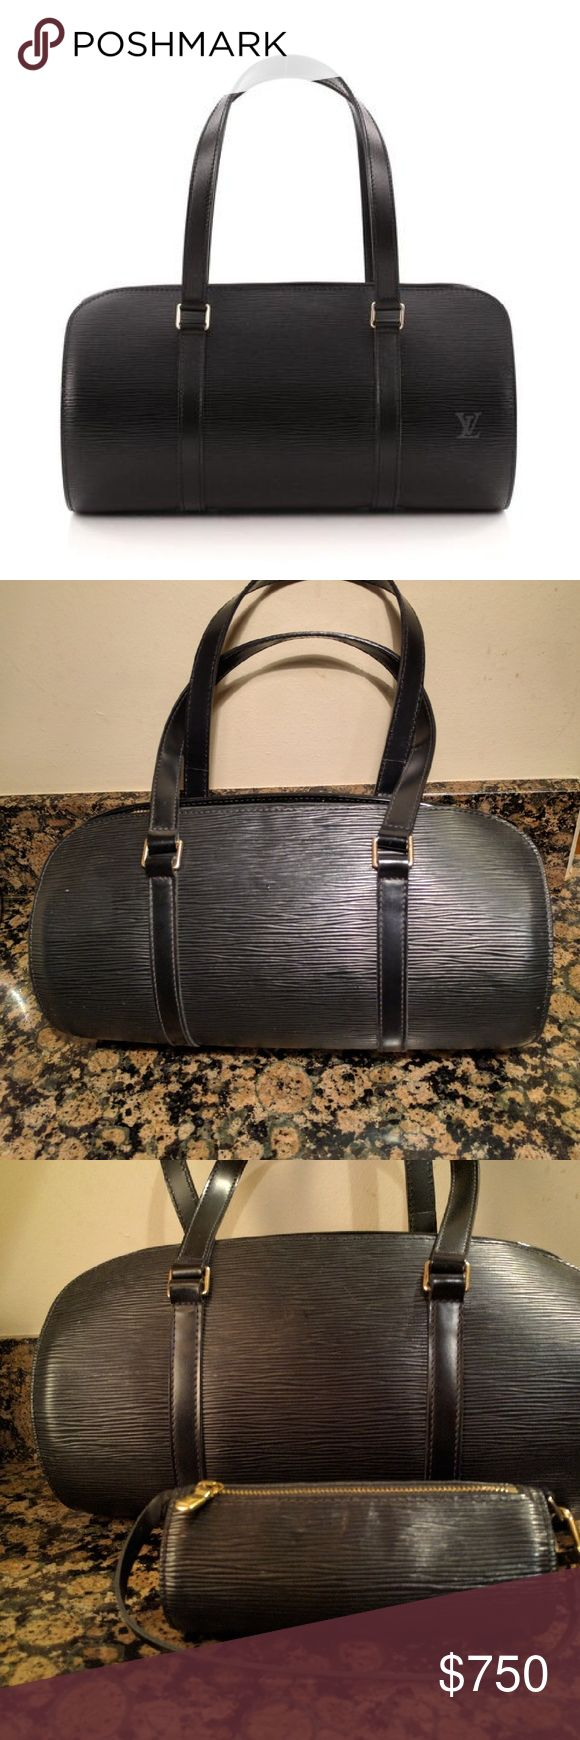 Louis Vuitton Soufflot Handbag Epi Leather w/ mini Strikingly sexy evening bag with razor sharp textured leather.  Will definitely delineate your chiaroscuro. Louis Vuitton Bags Mini Bags